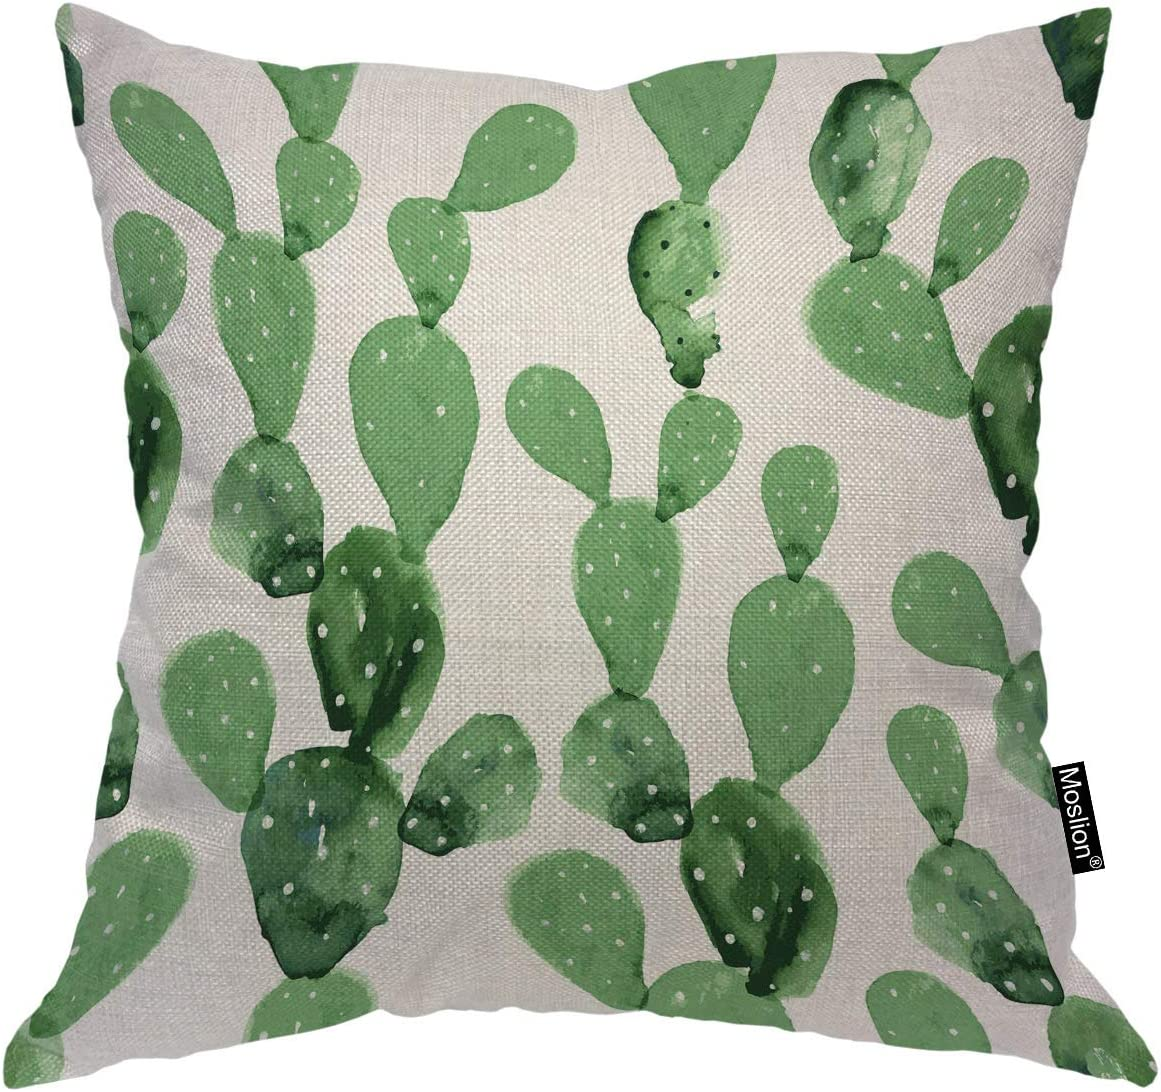 Amazon Com Moslion Cactus Pillow Case Nature Botanical Plant Hawaii Succulent Cacti Dot Throw Pillow Cover Cotton Linen For Home Sofa Decorative Square Cushion 24x24 Inch Green White Home Kitchen